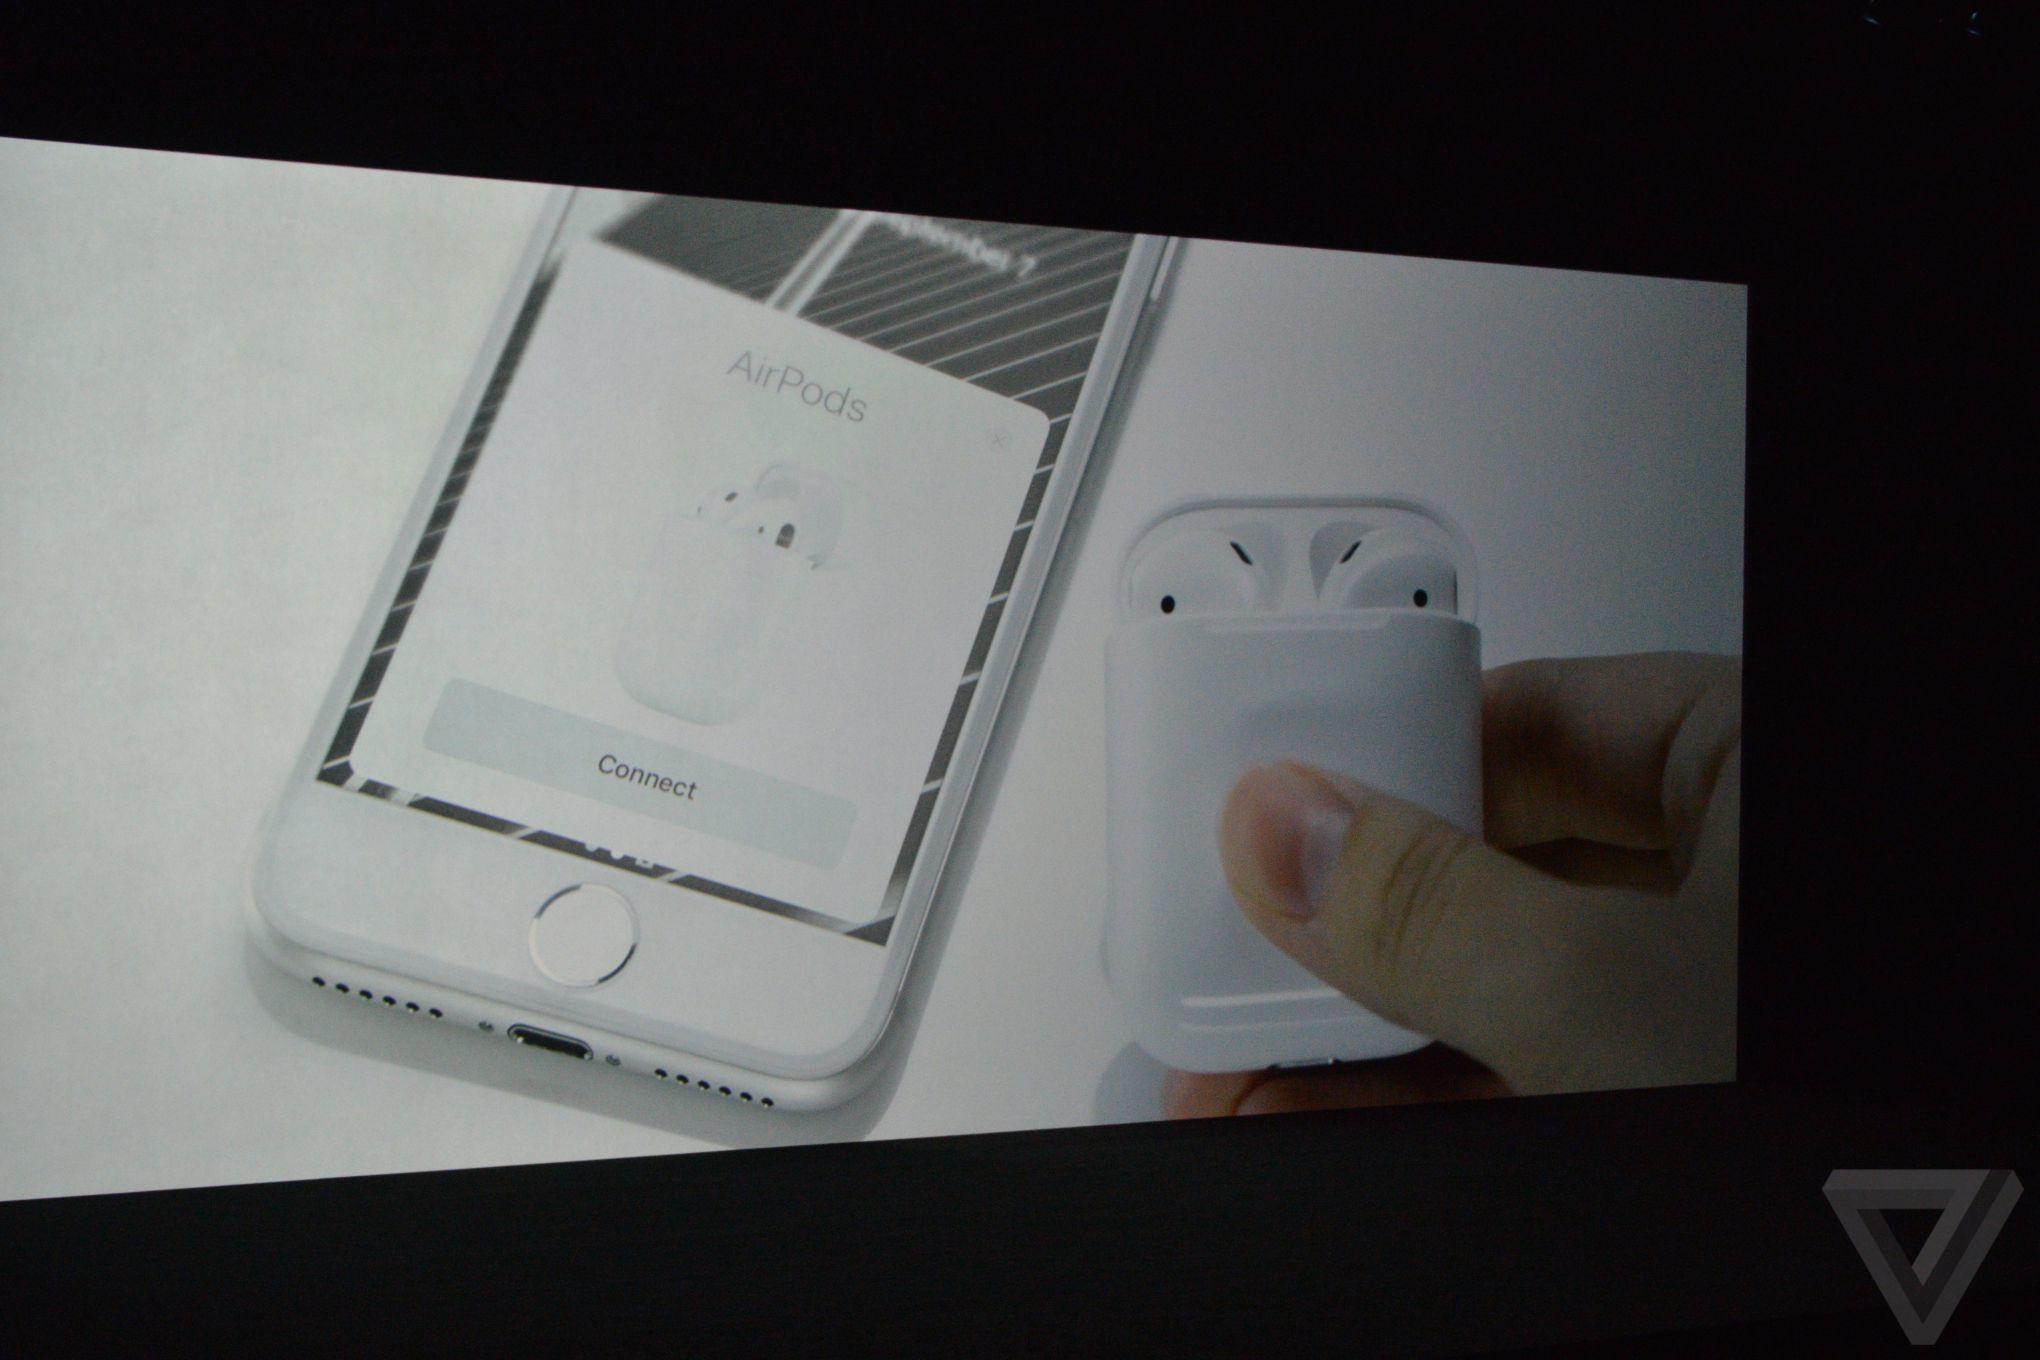 iphone 7 apple watch series 2 airpods und super mario. Black Bedroom Furniture Sets. Home Design Ideas